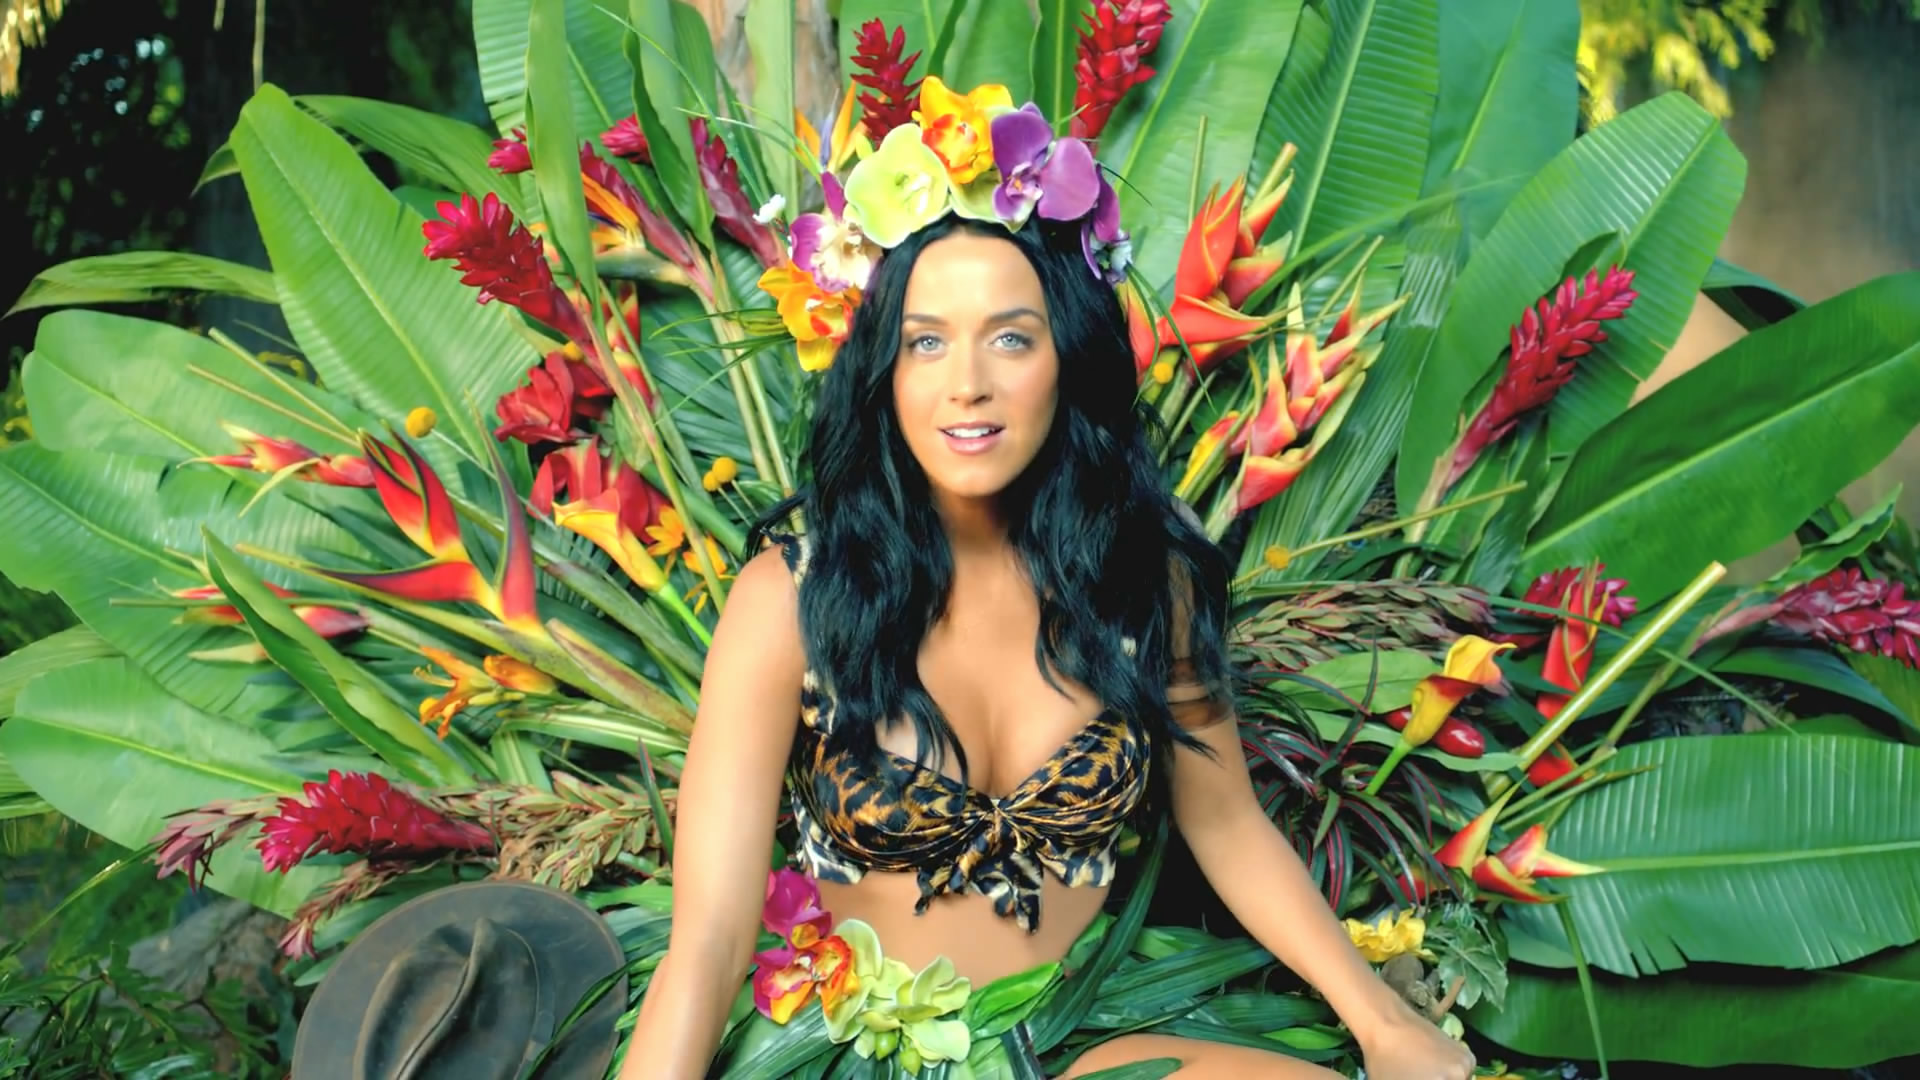 Katy Perry Roar Wallpaper (69+ images)